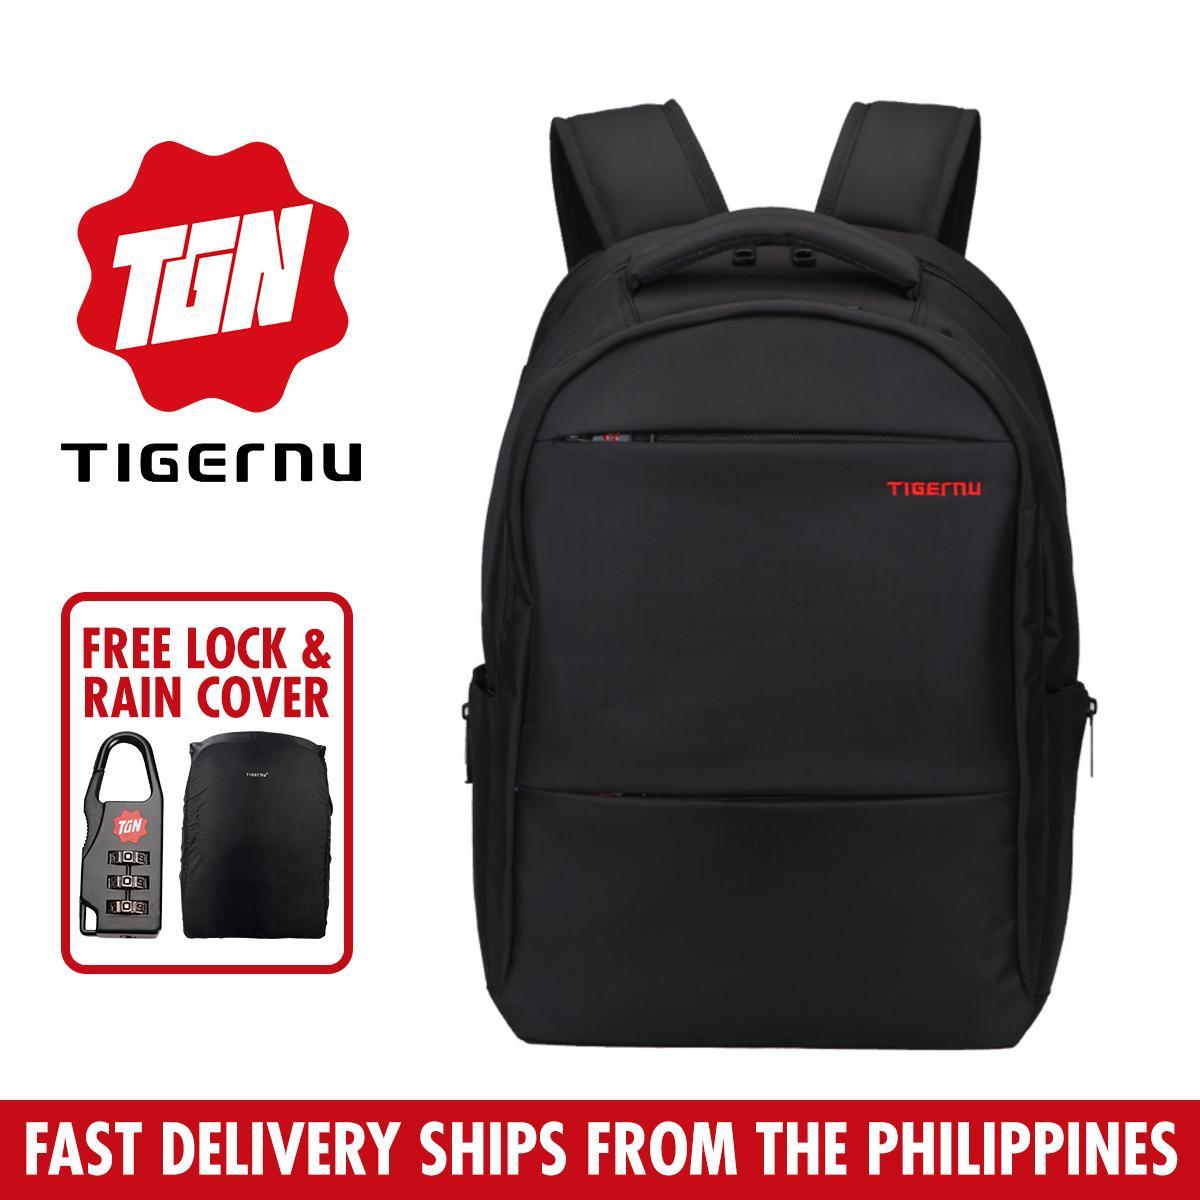 36778a4f7b5 TigerNu T-B3032A 17 inches Anti-Theft Laptop Business Backpack School Bag w